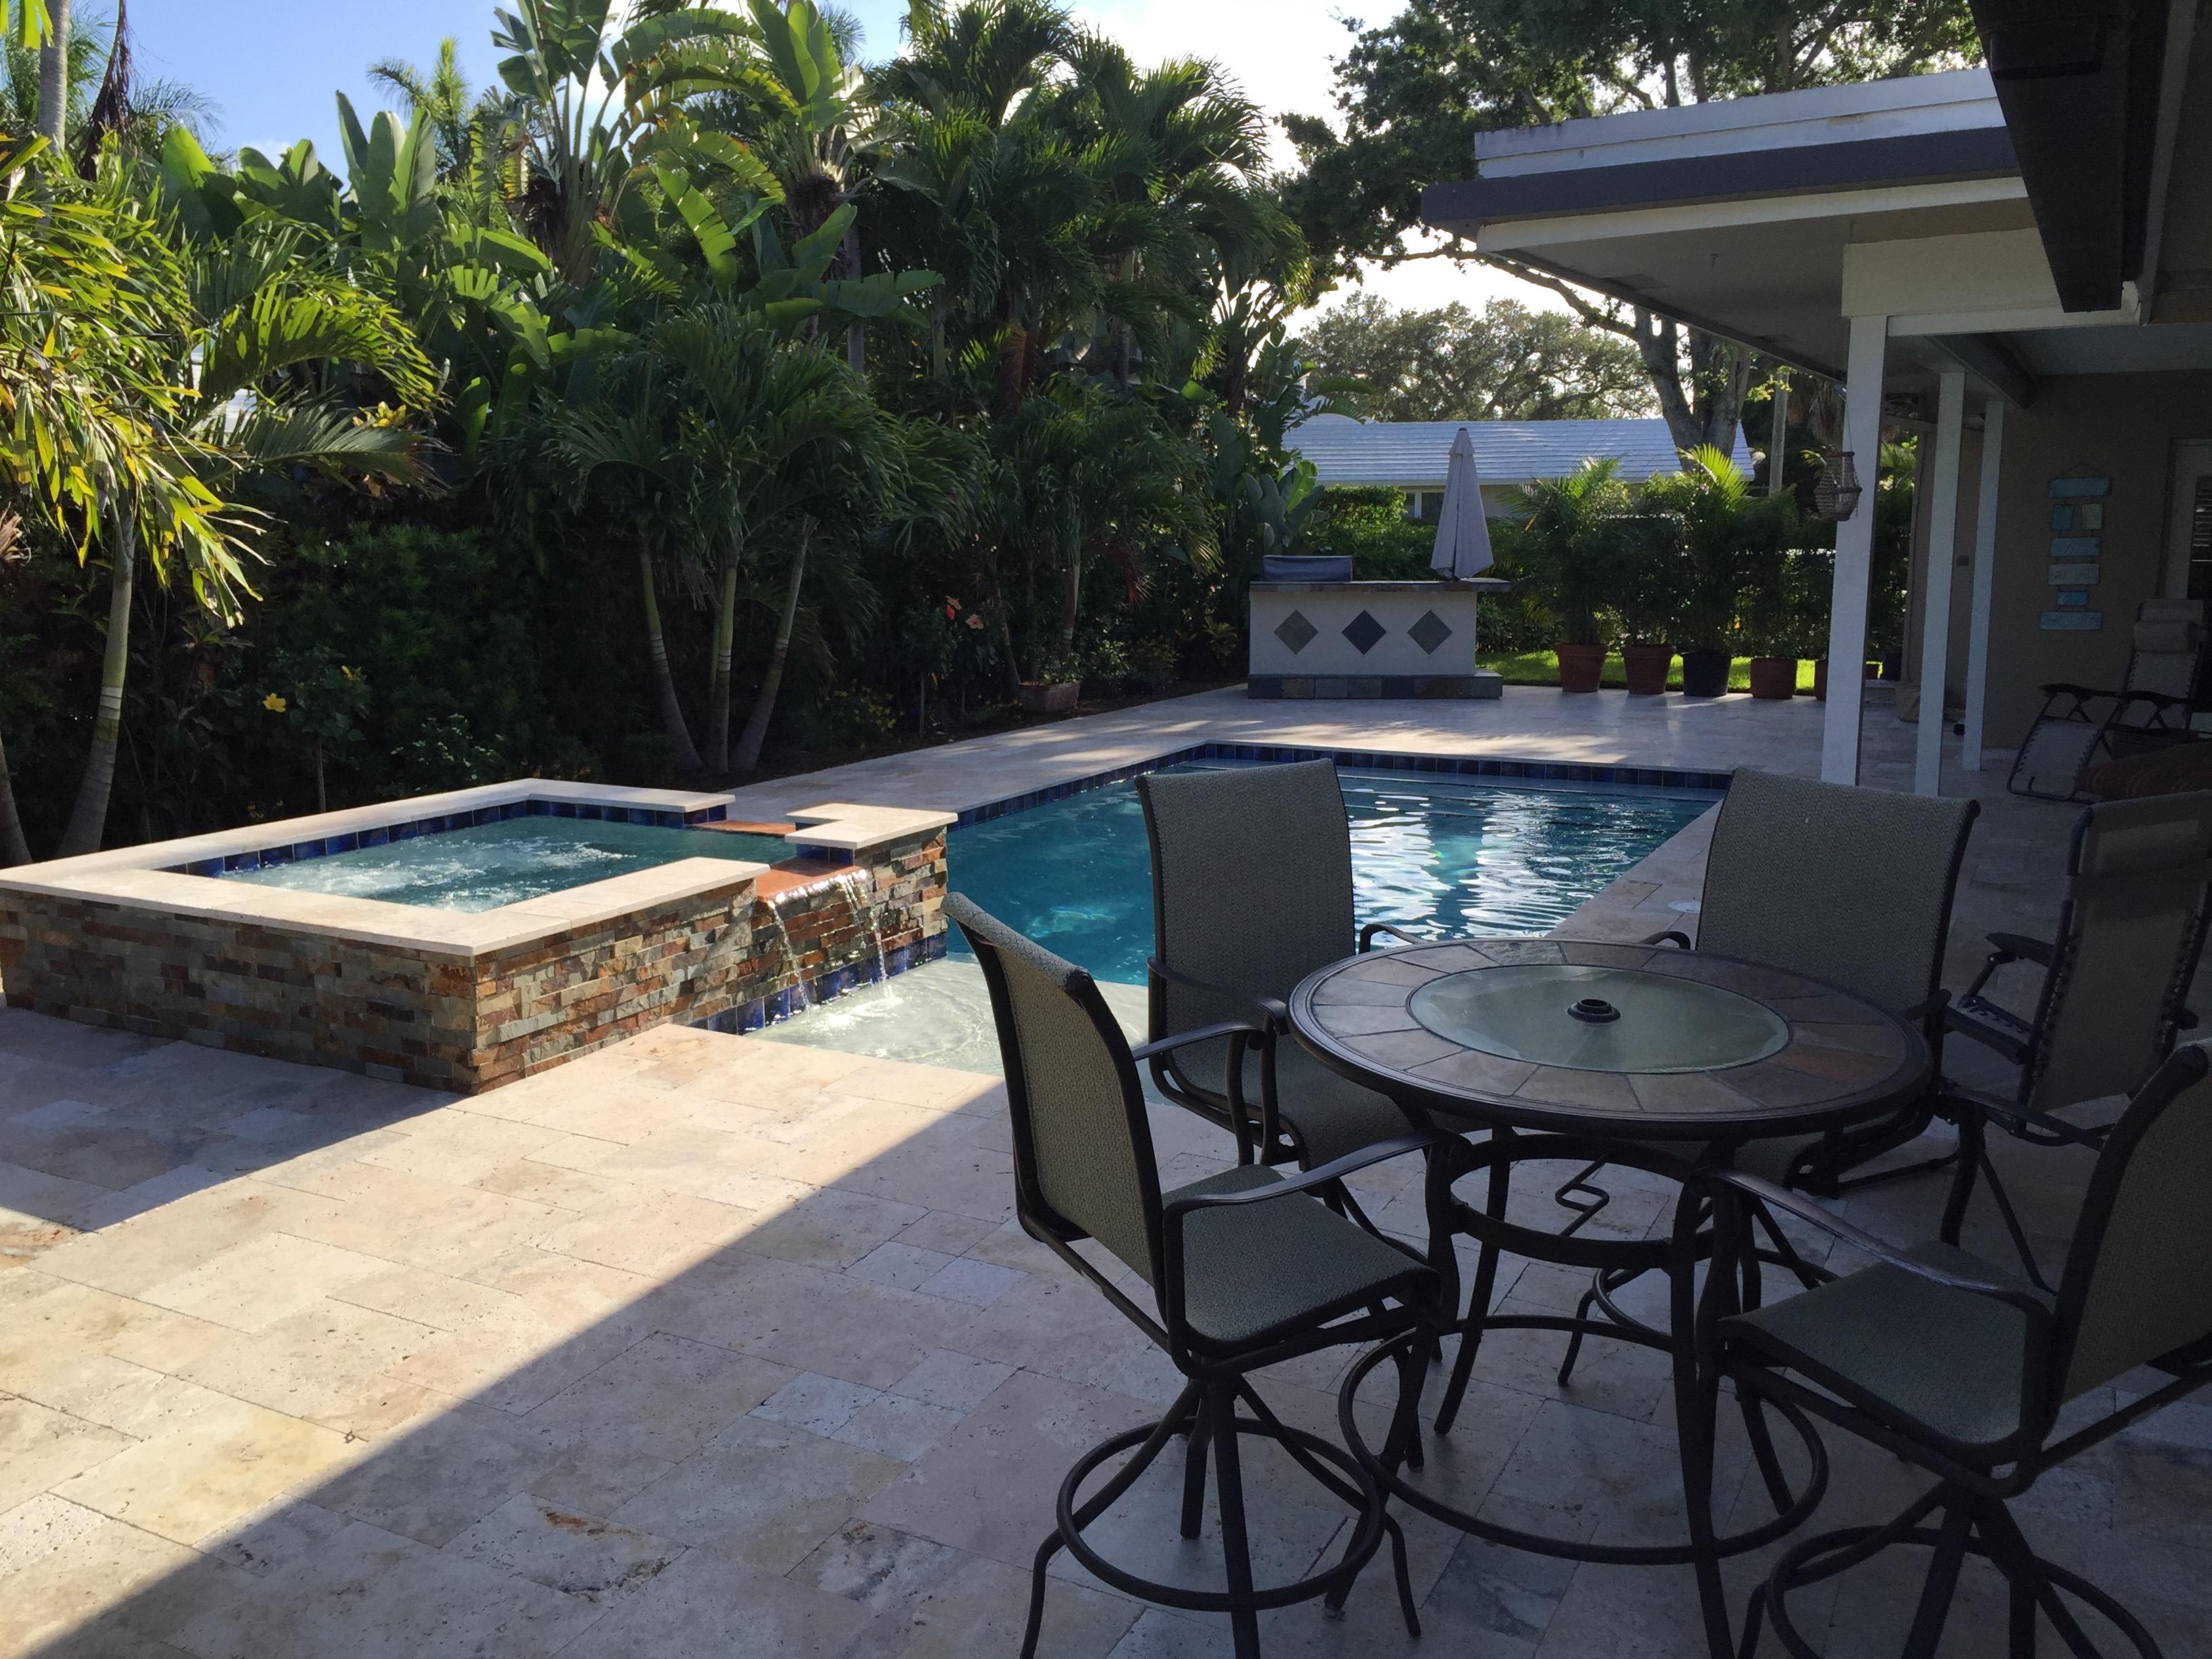 Aquafresh Pools Your Pool Company